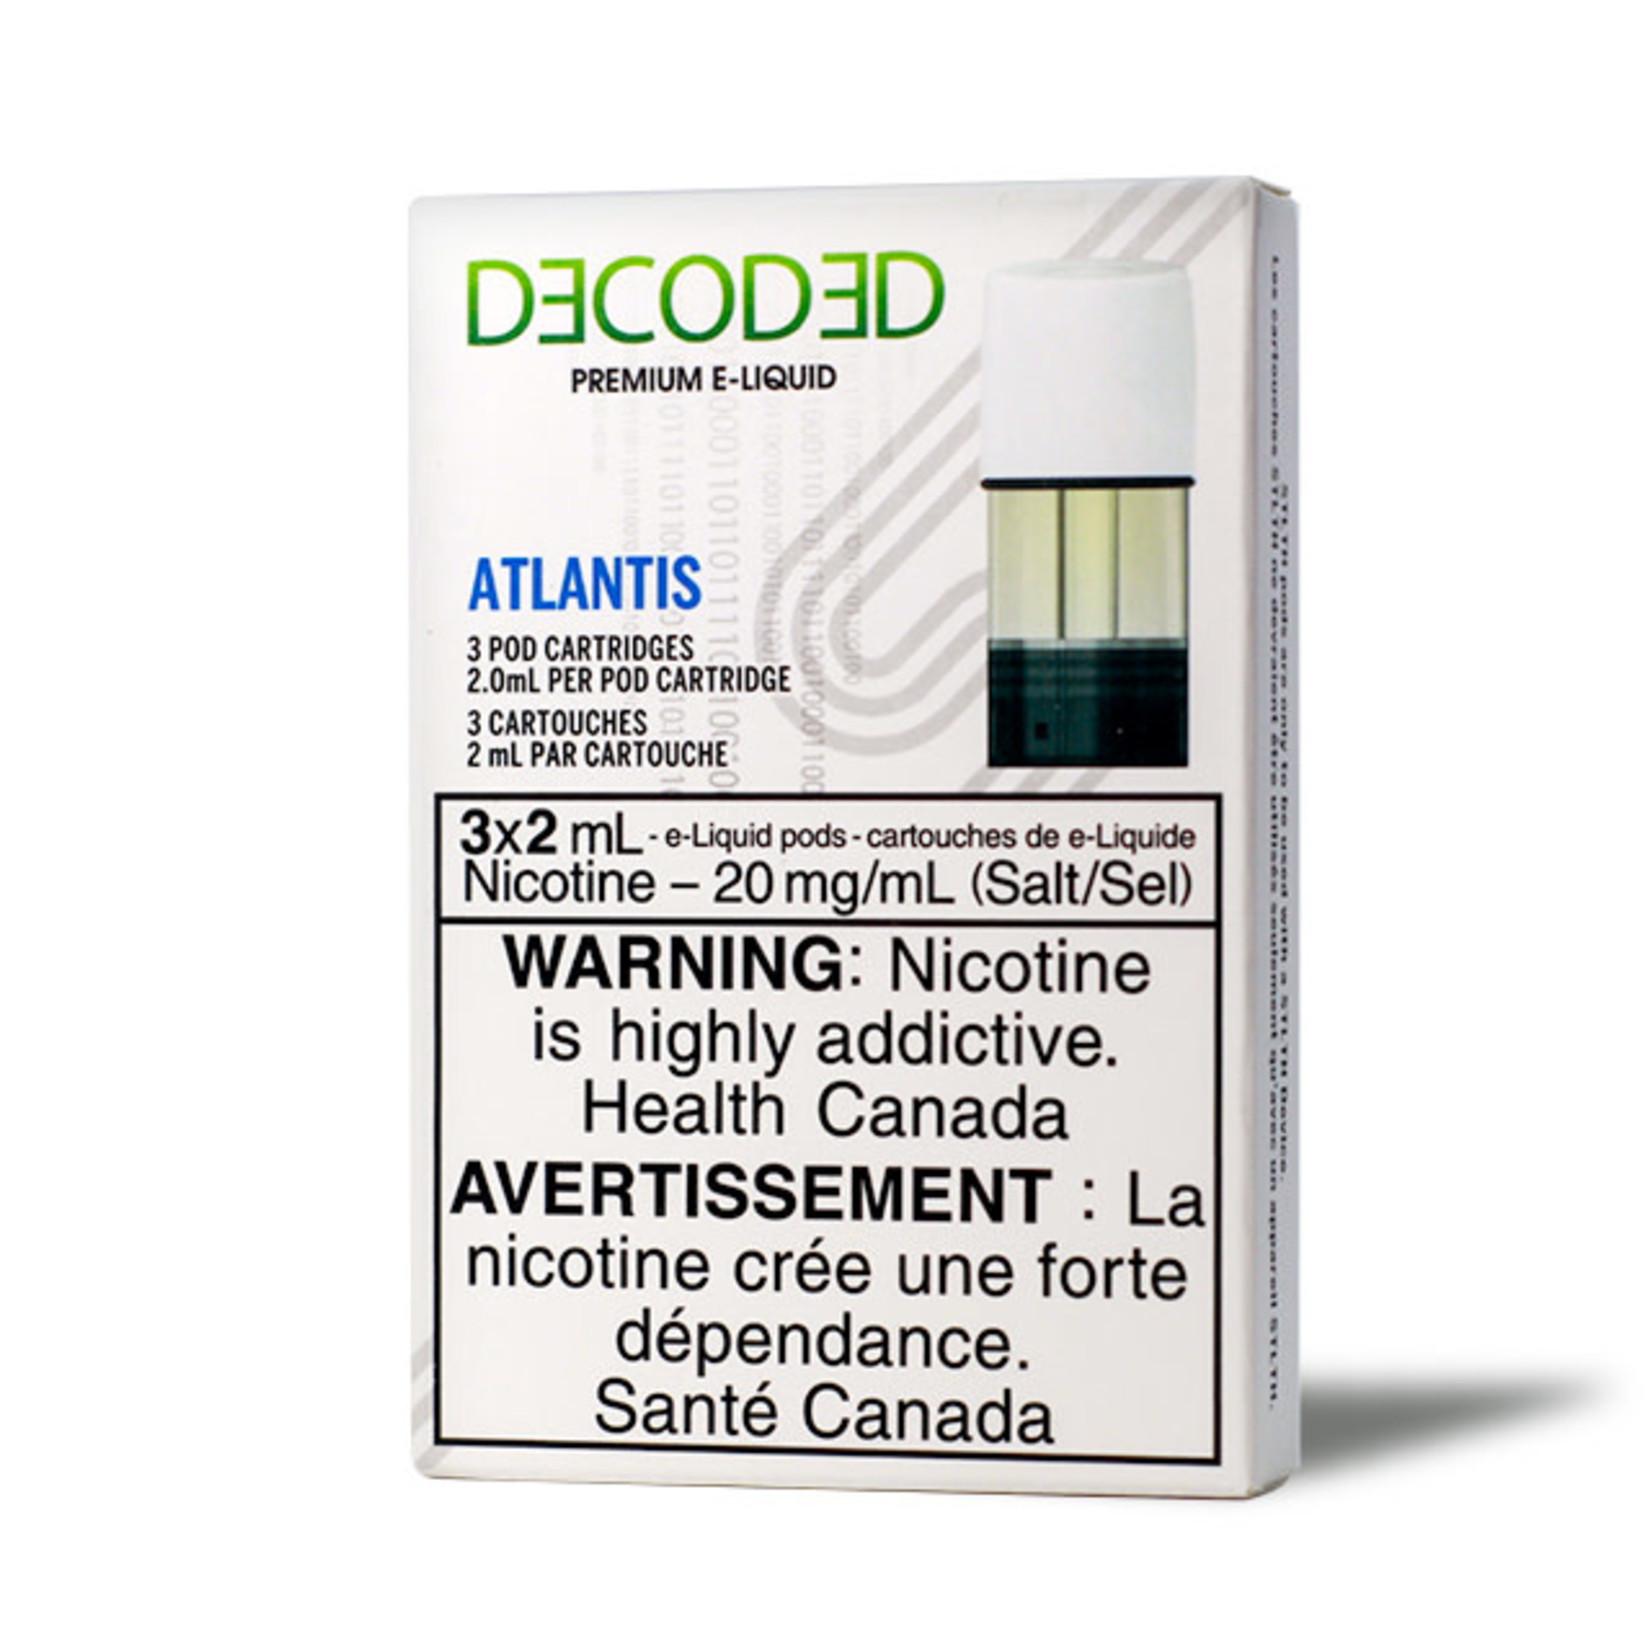 STLTH Pod Pack Decoded Atlantis